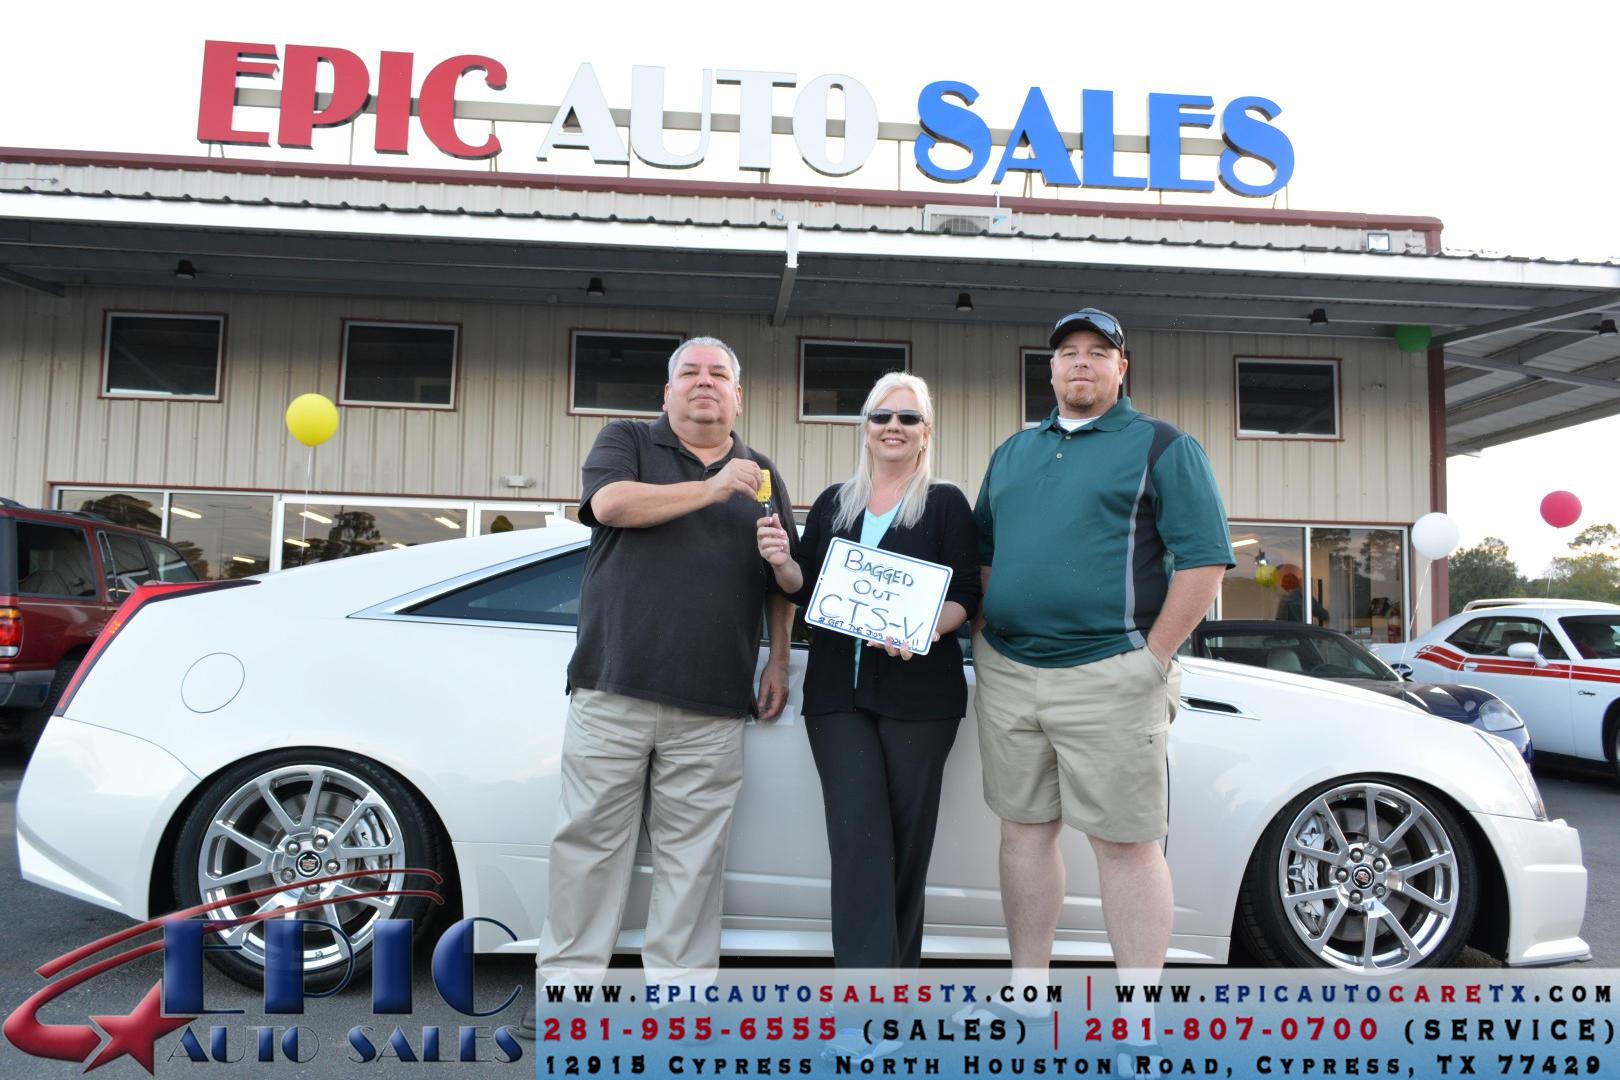 Epic Auto Sales image 4